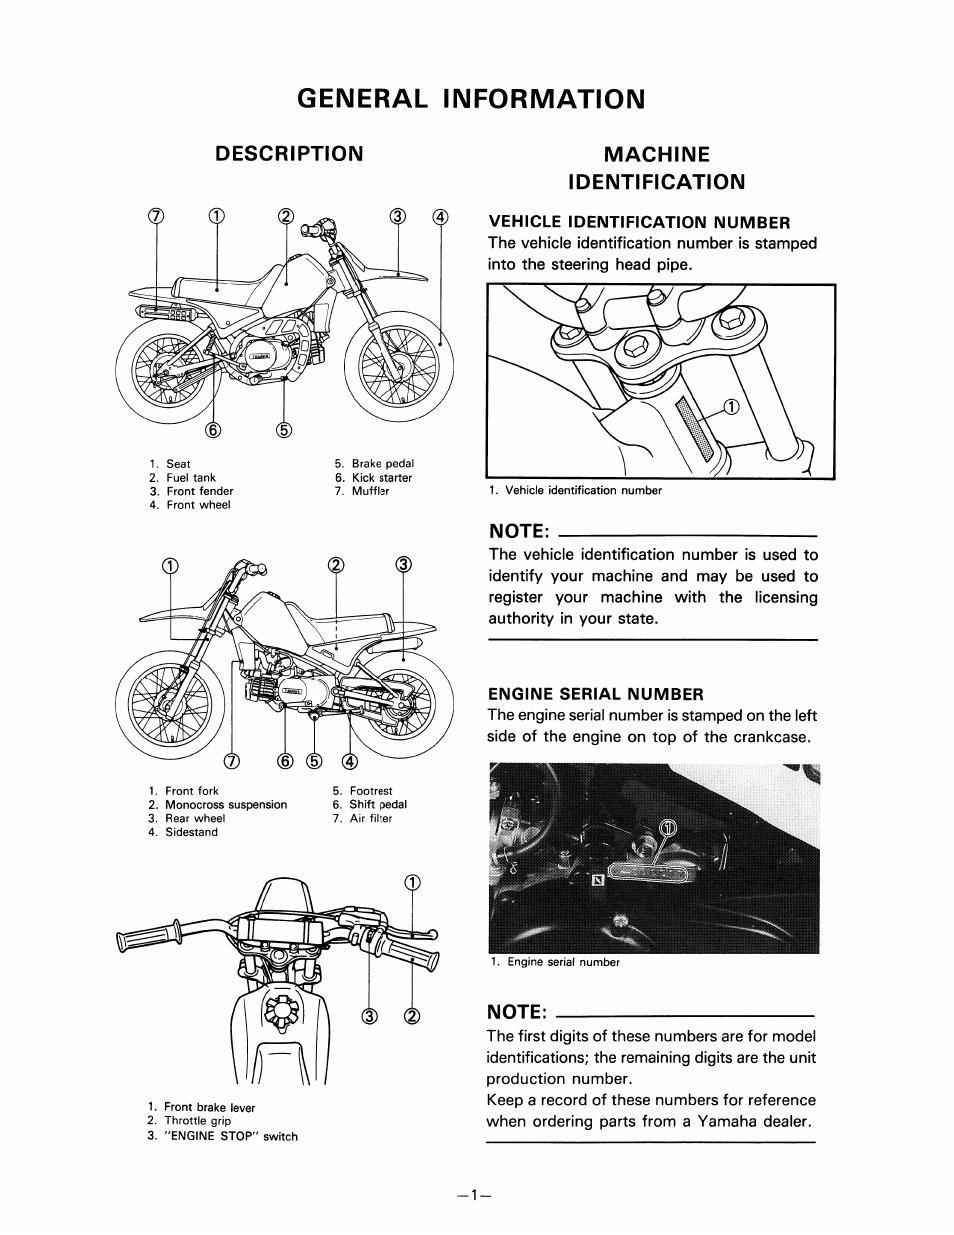 General information, Machine, Identification | Yamaha pw80 User